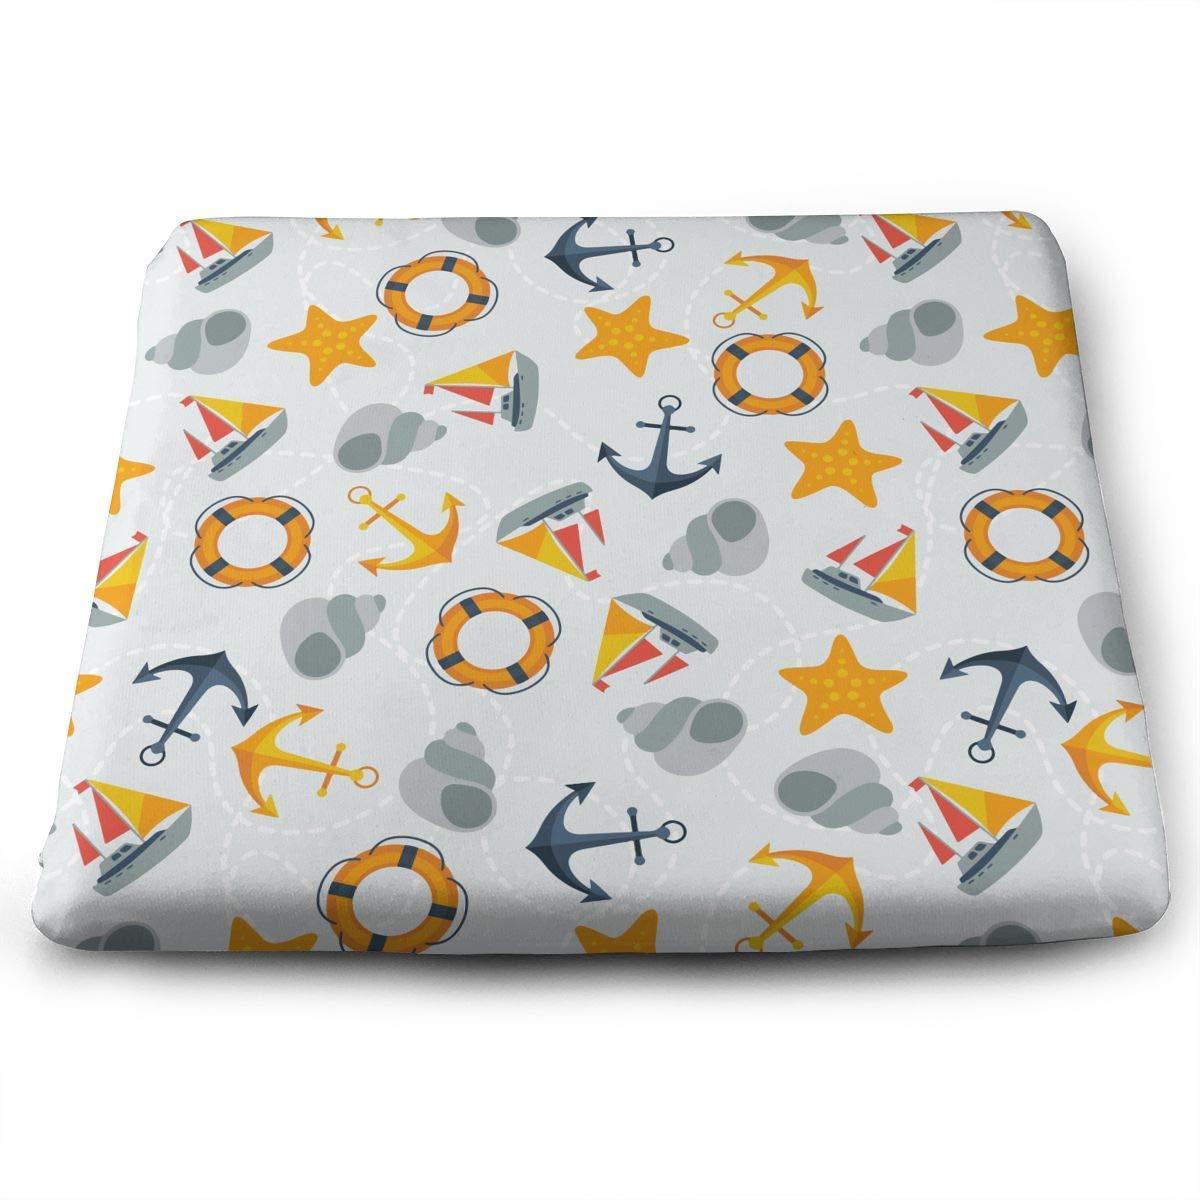 Amazon.com: Seat Cushion for Office Chair, Stars Nautical ...